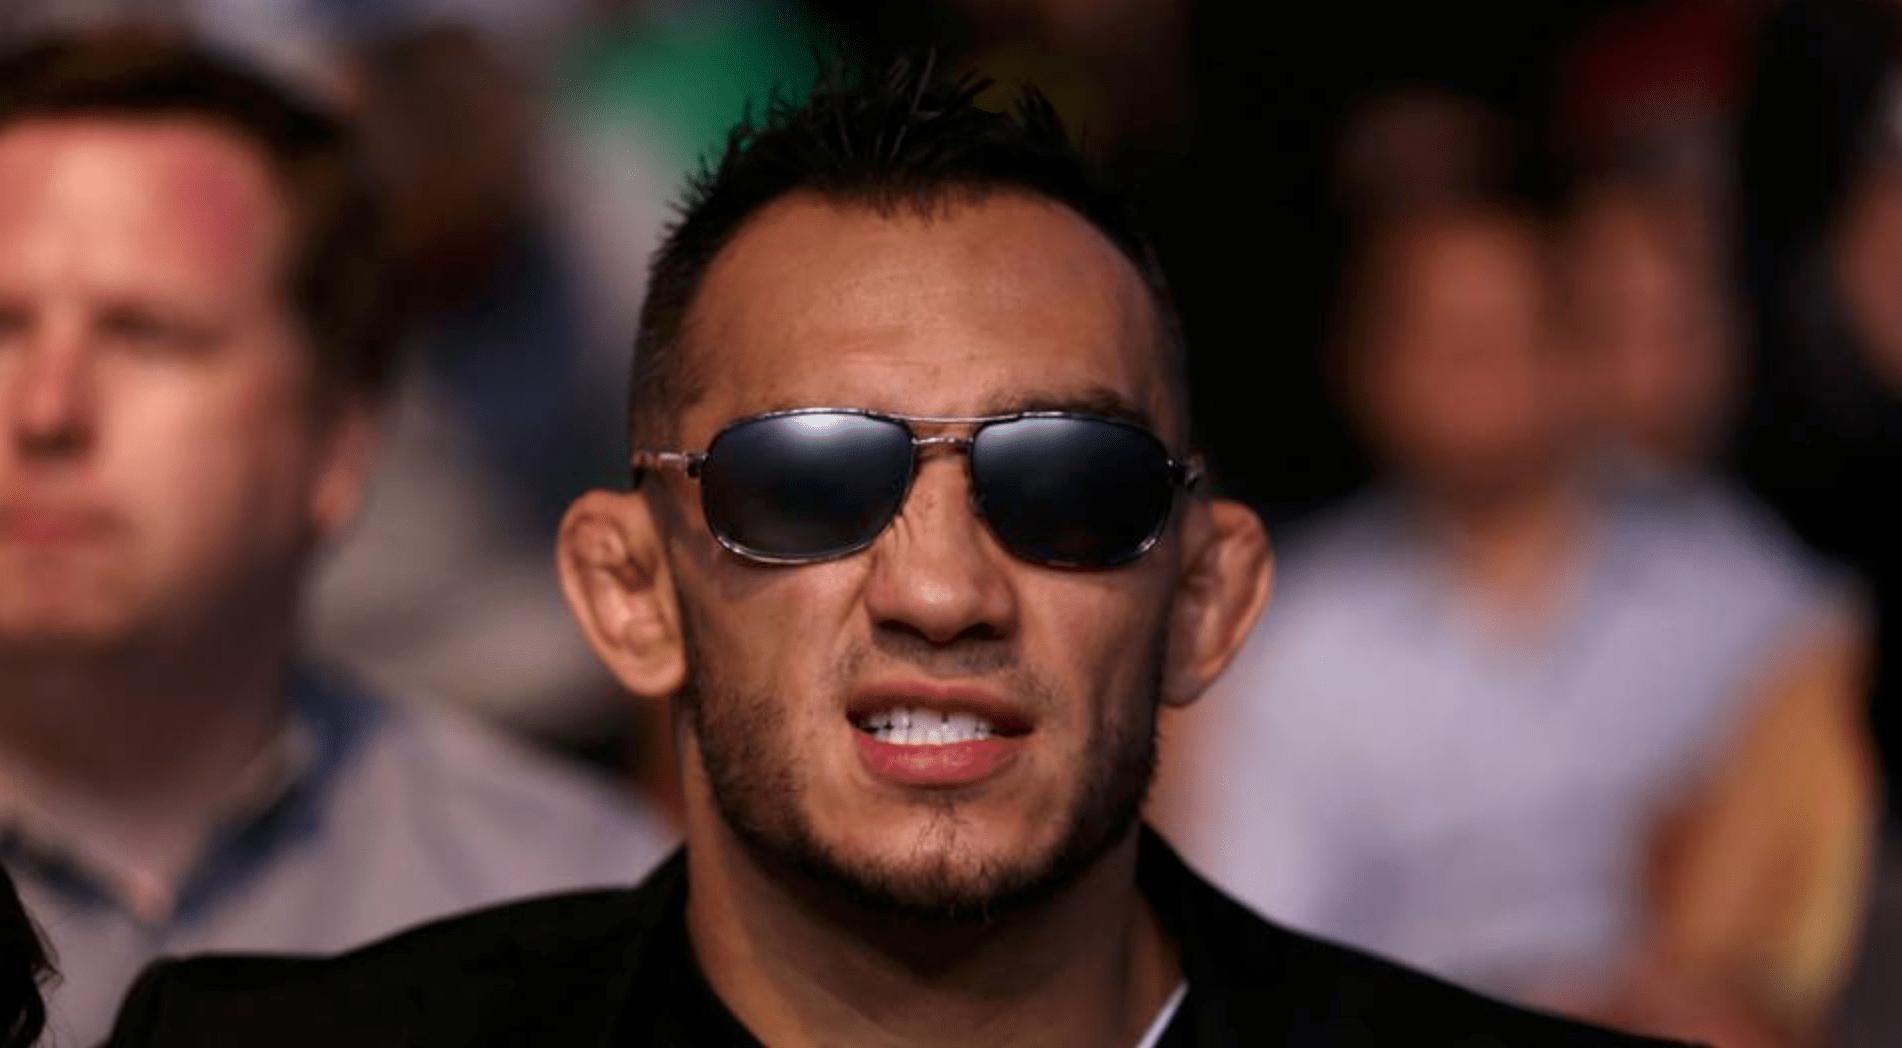 Tony Ferguson Ready To Step In For Khabib Or Poirier At UFC 242